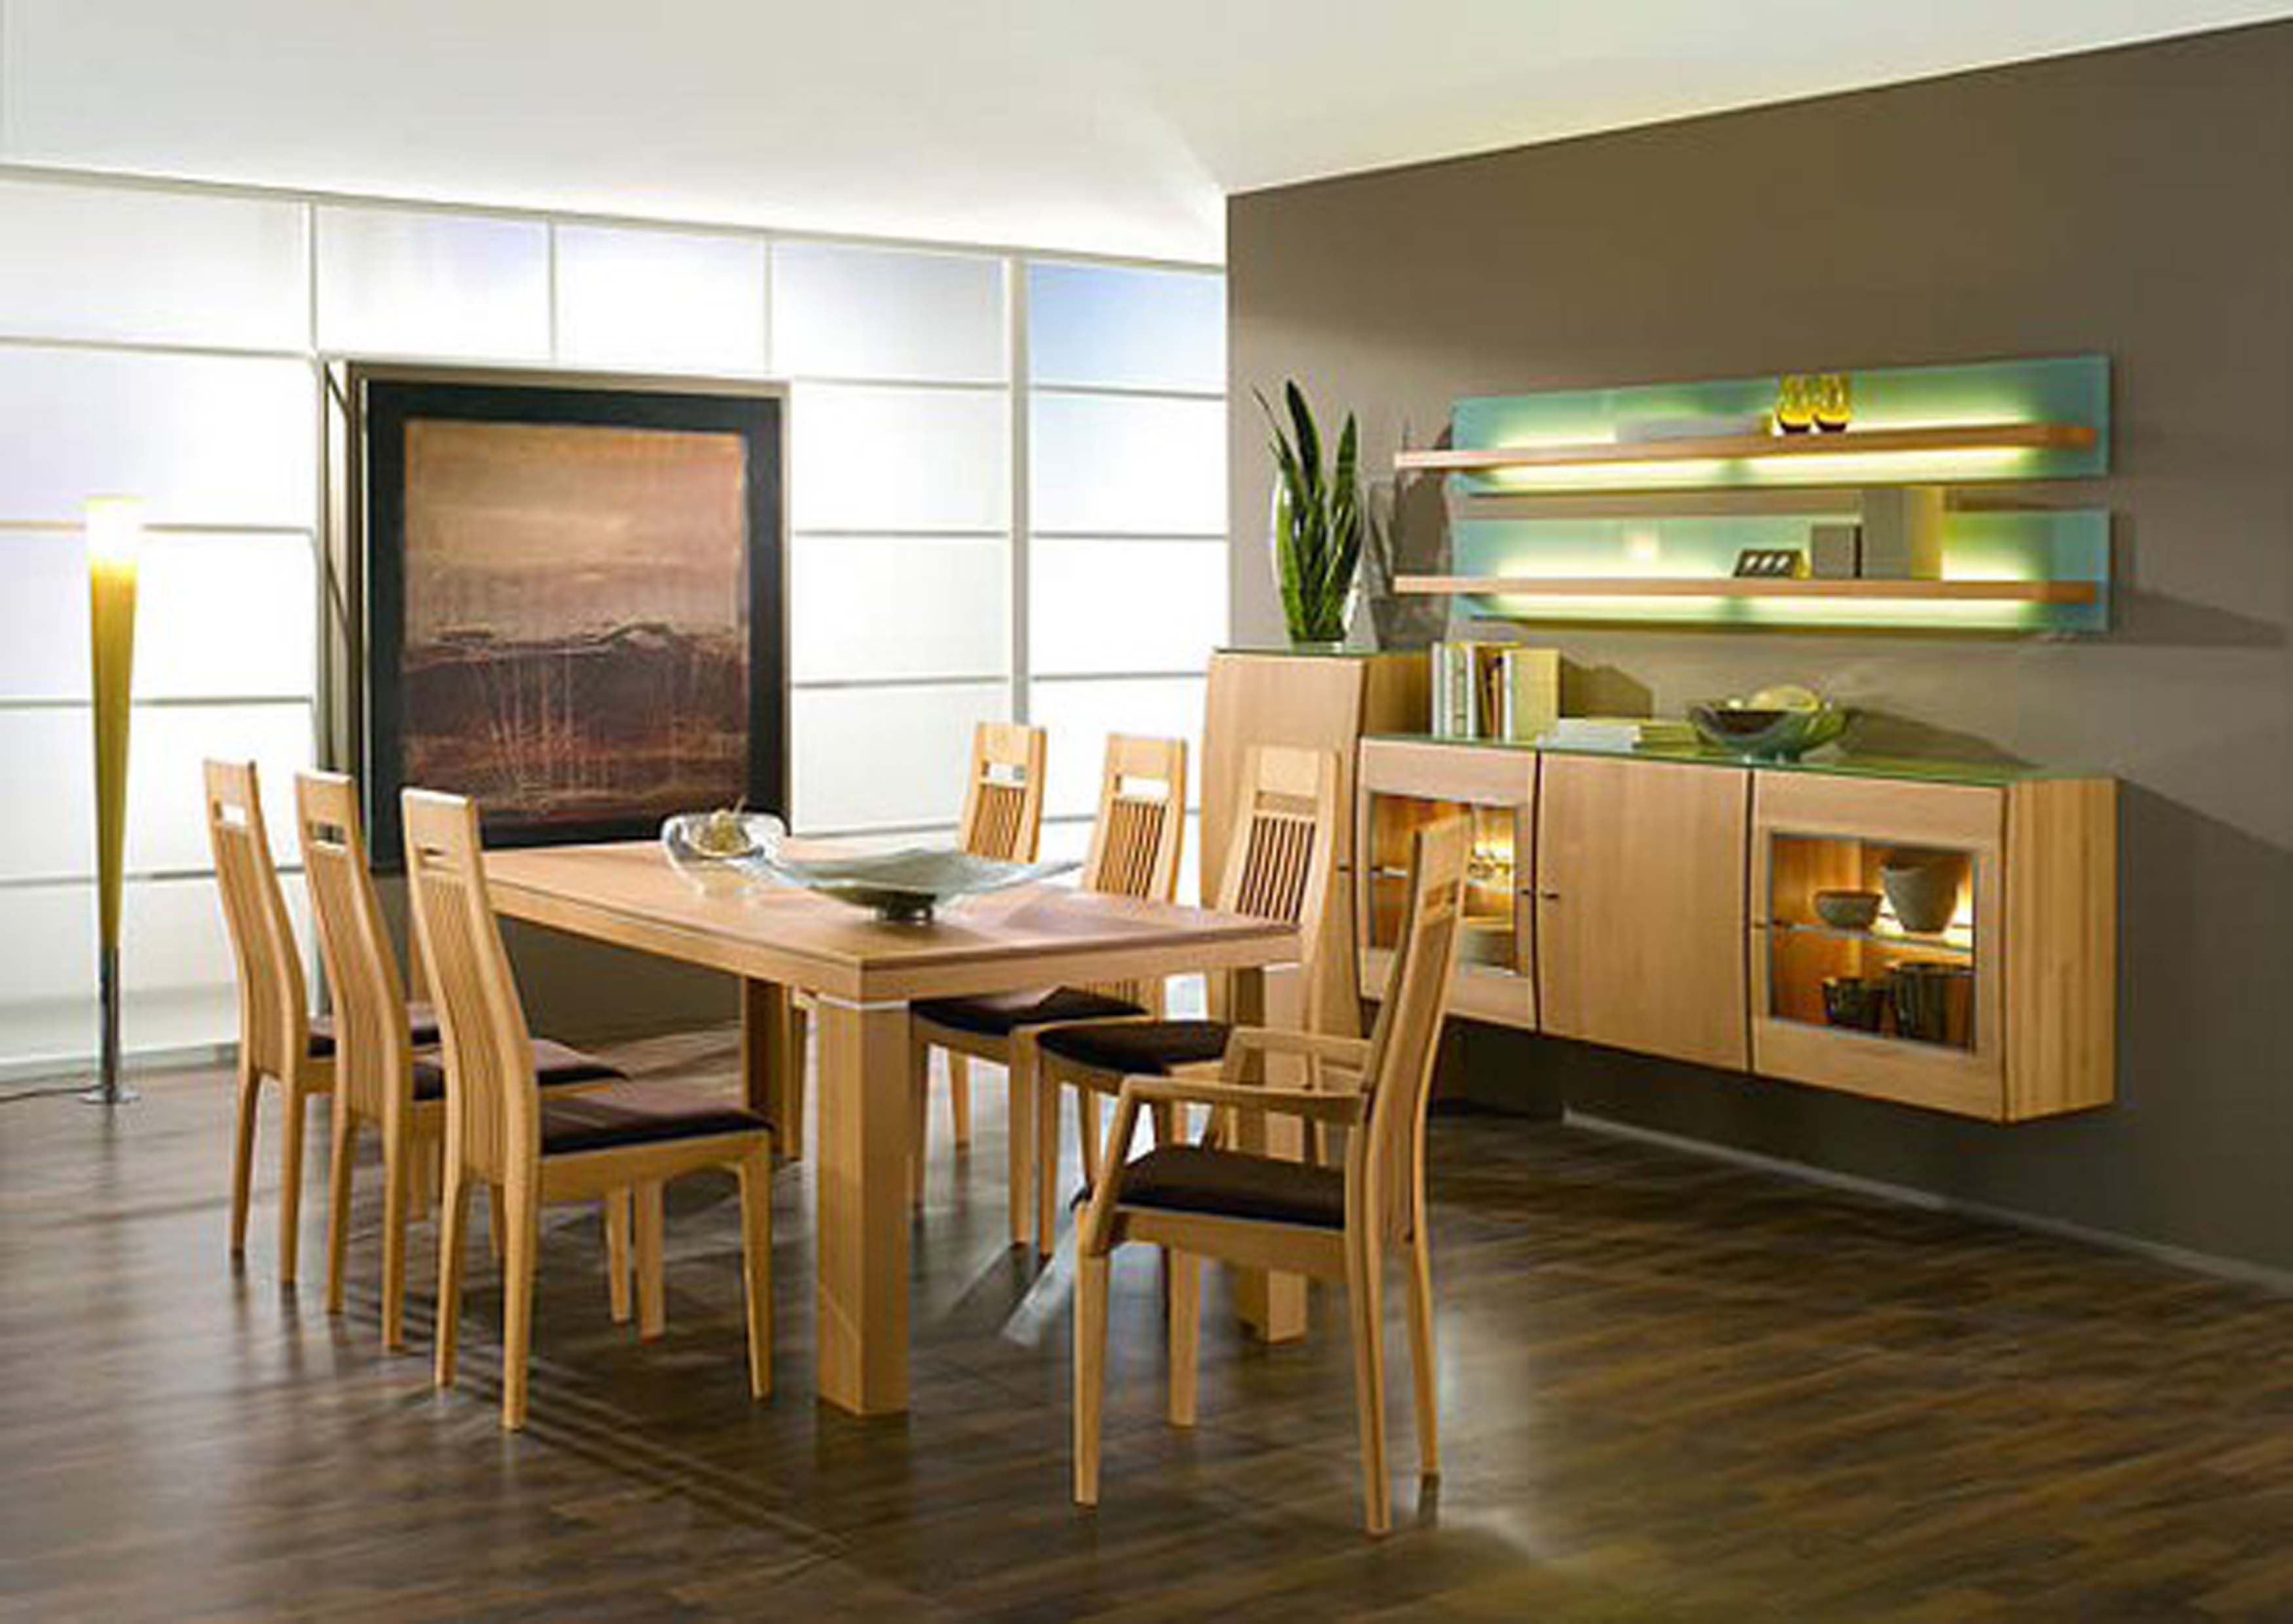 Ultra modern dining room table httpsservageoneorg Interiors